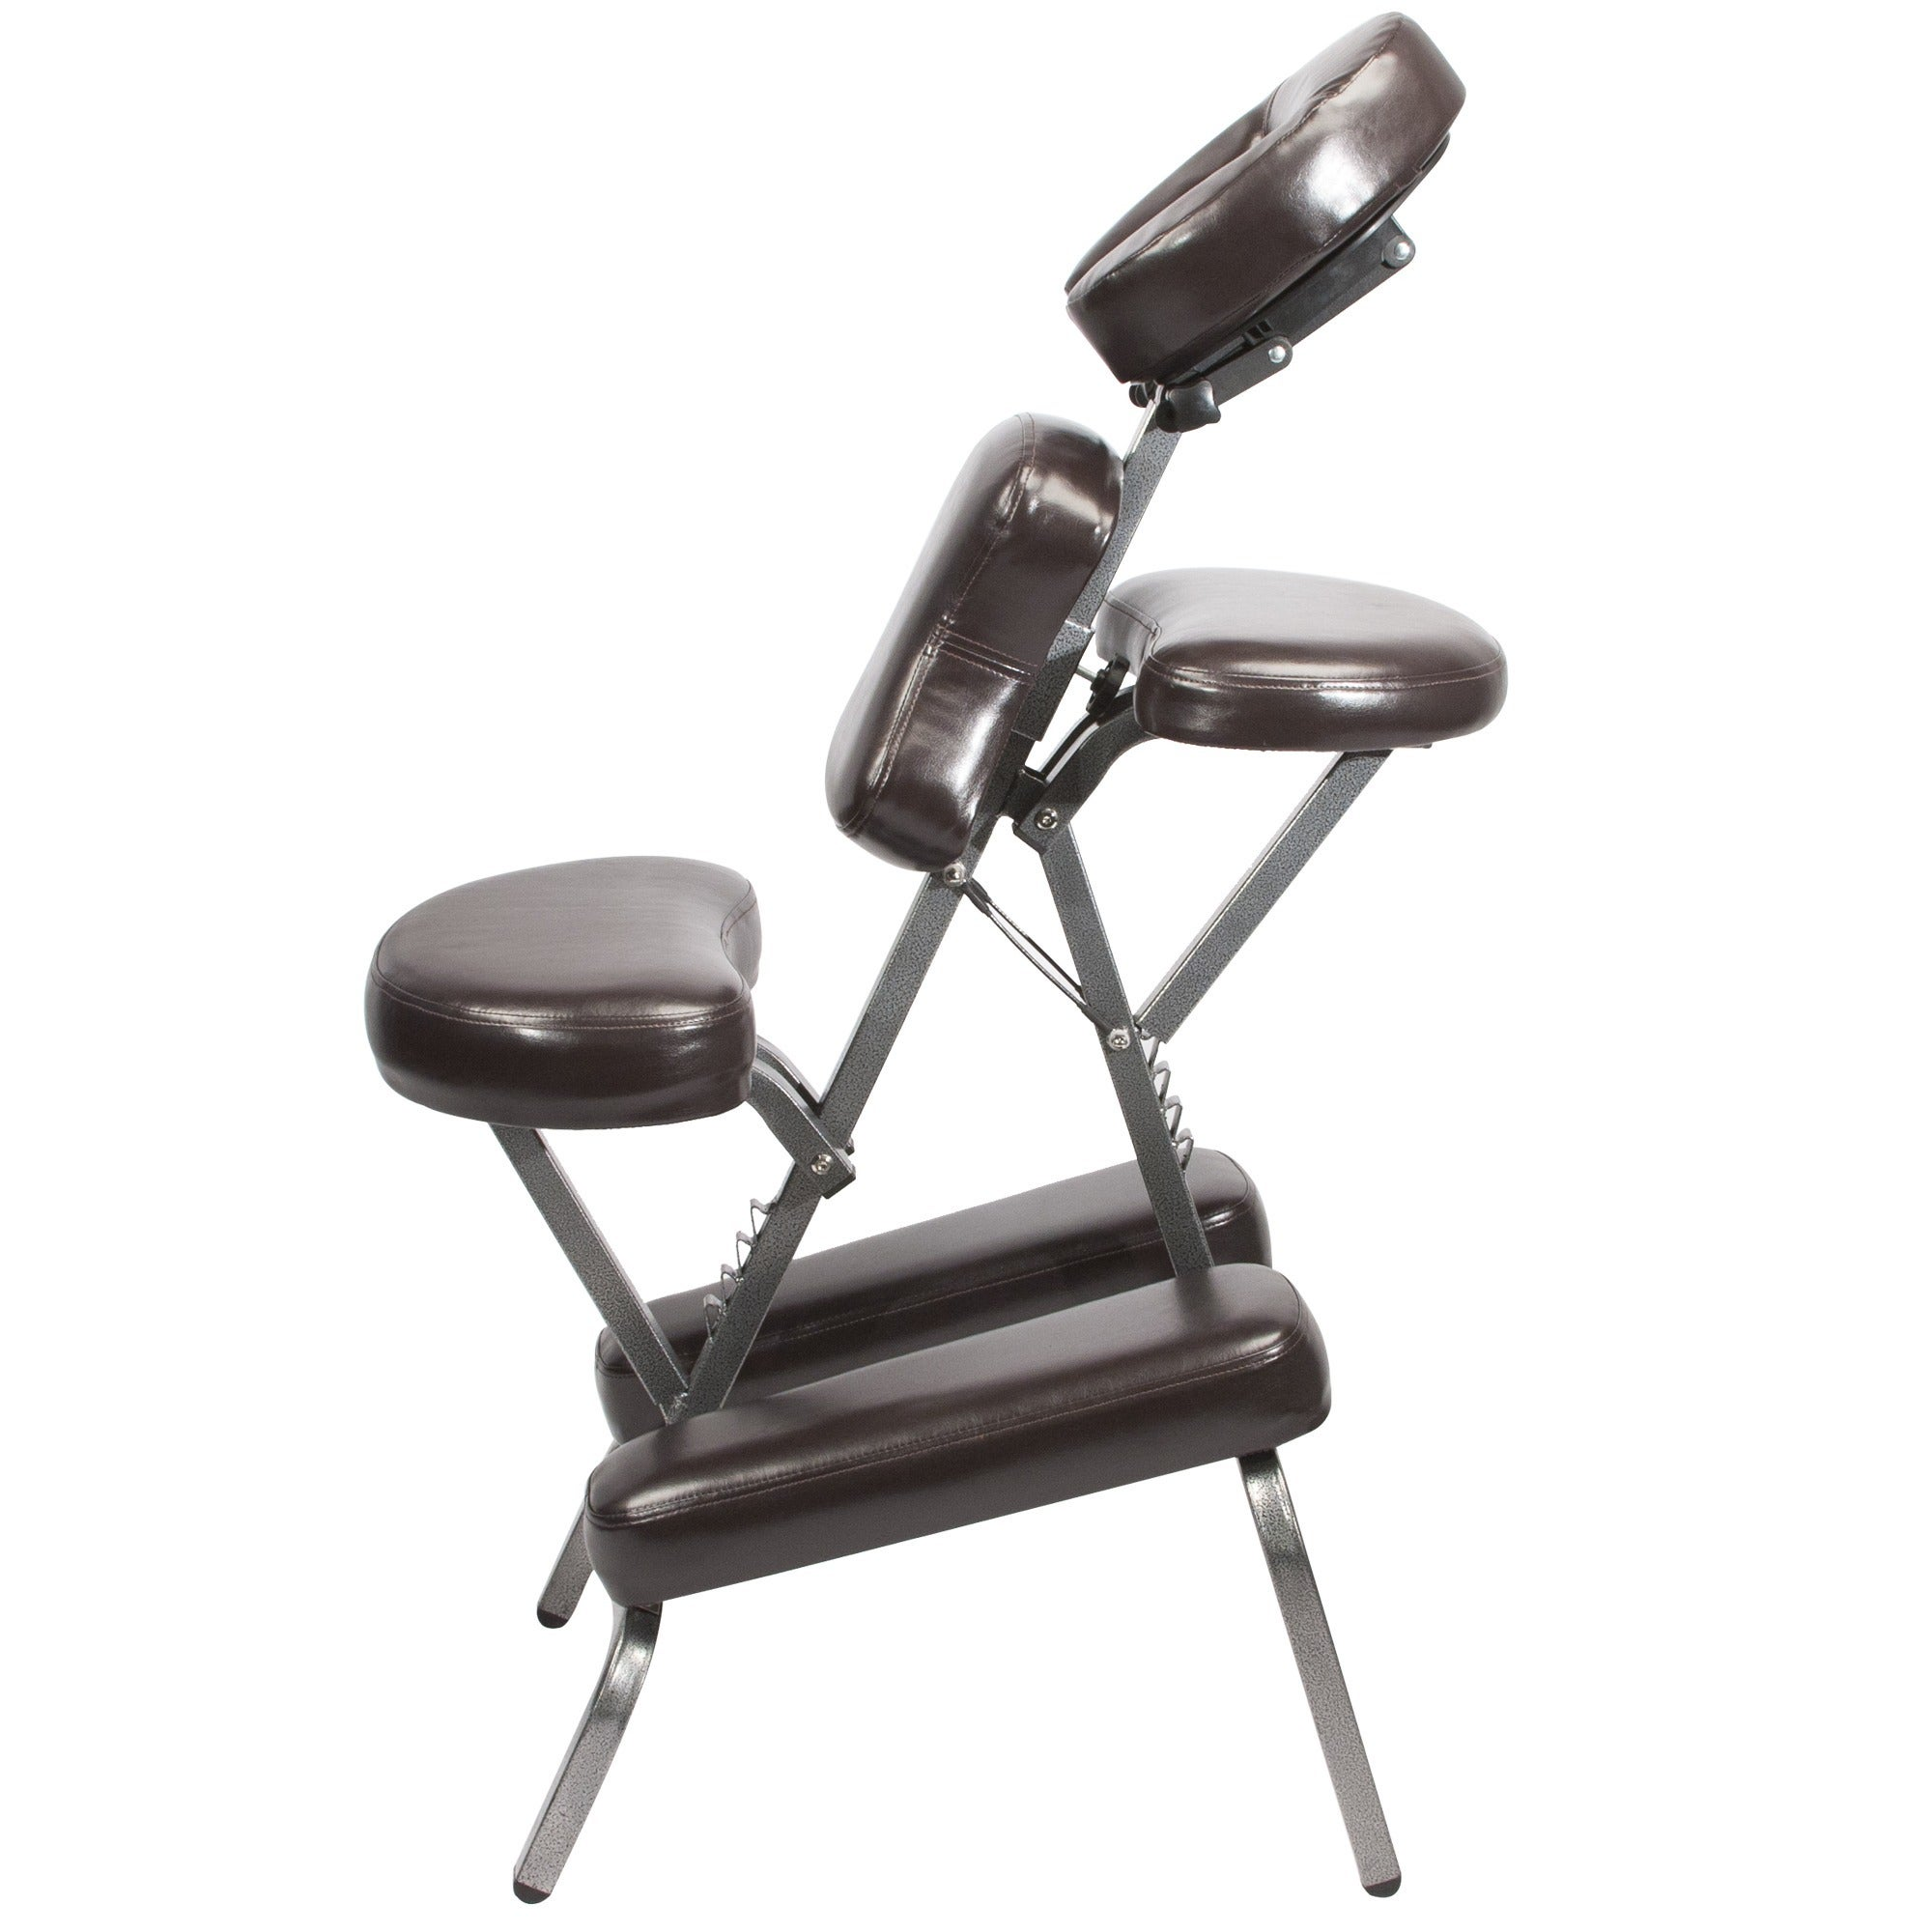 chair ip tall com cost multiple colors memory big walmart foam massage serta recliner